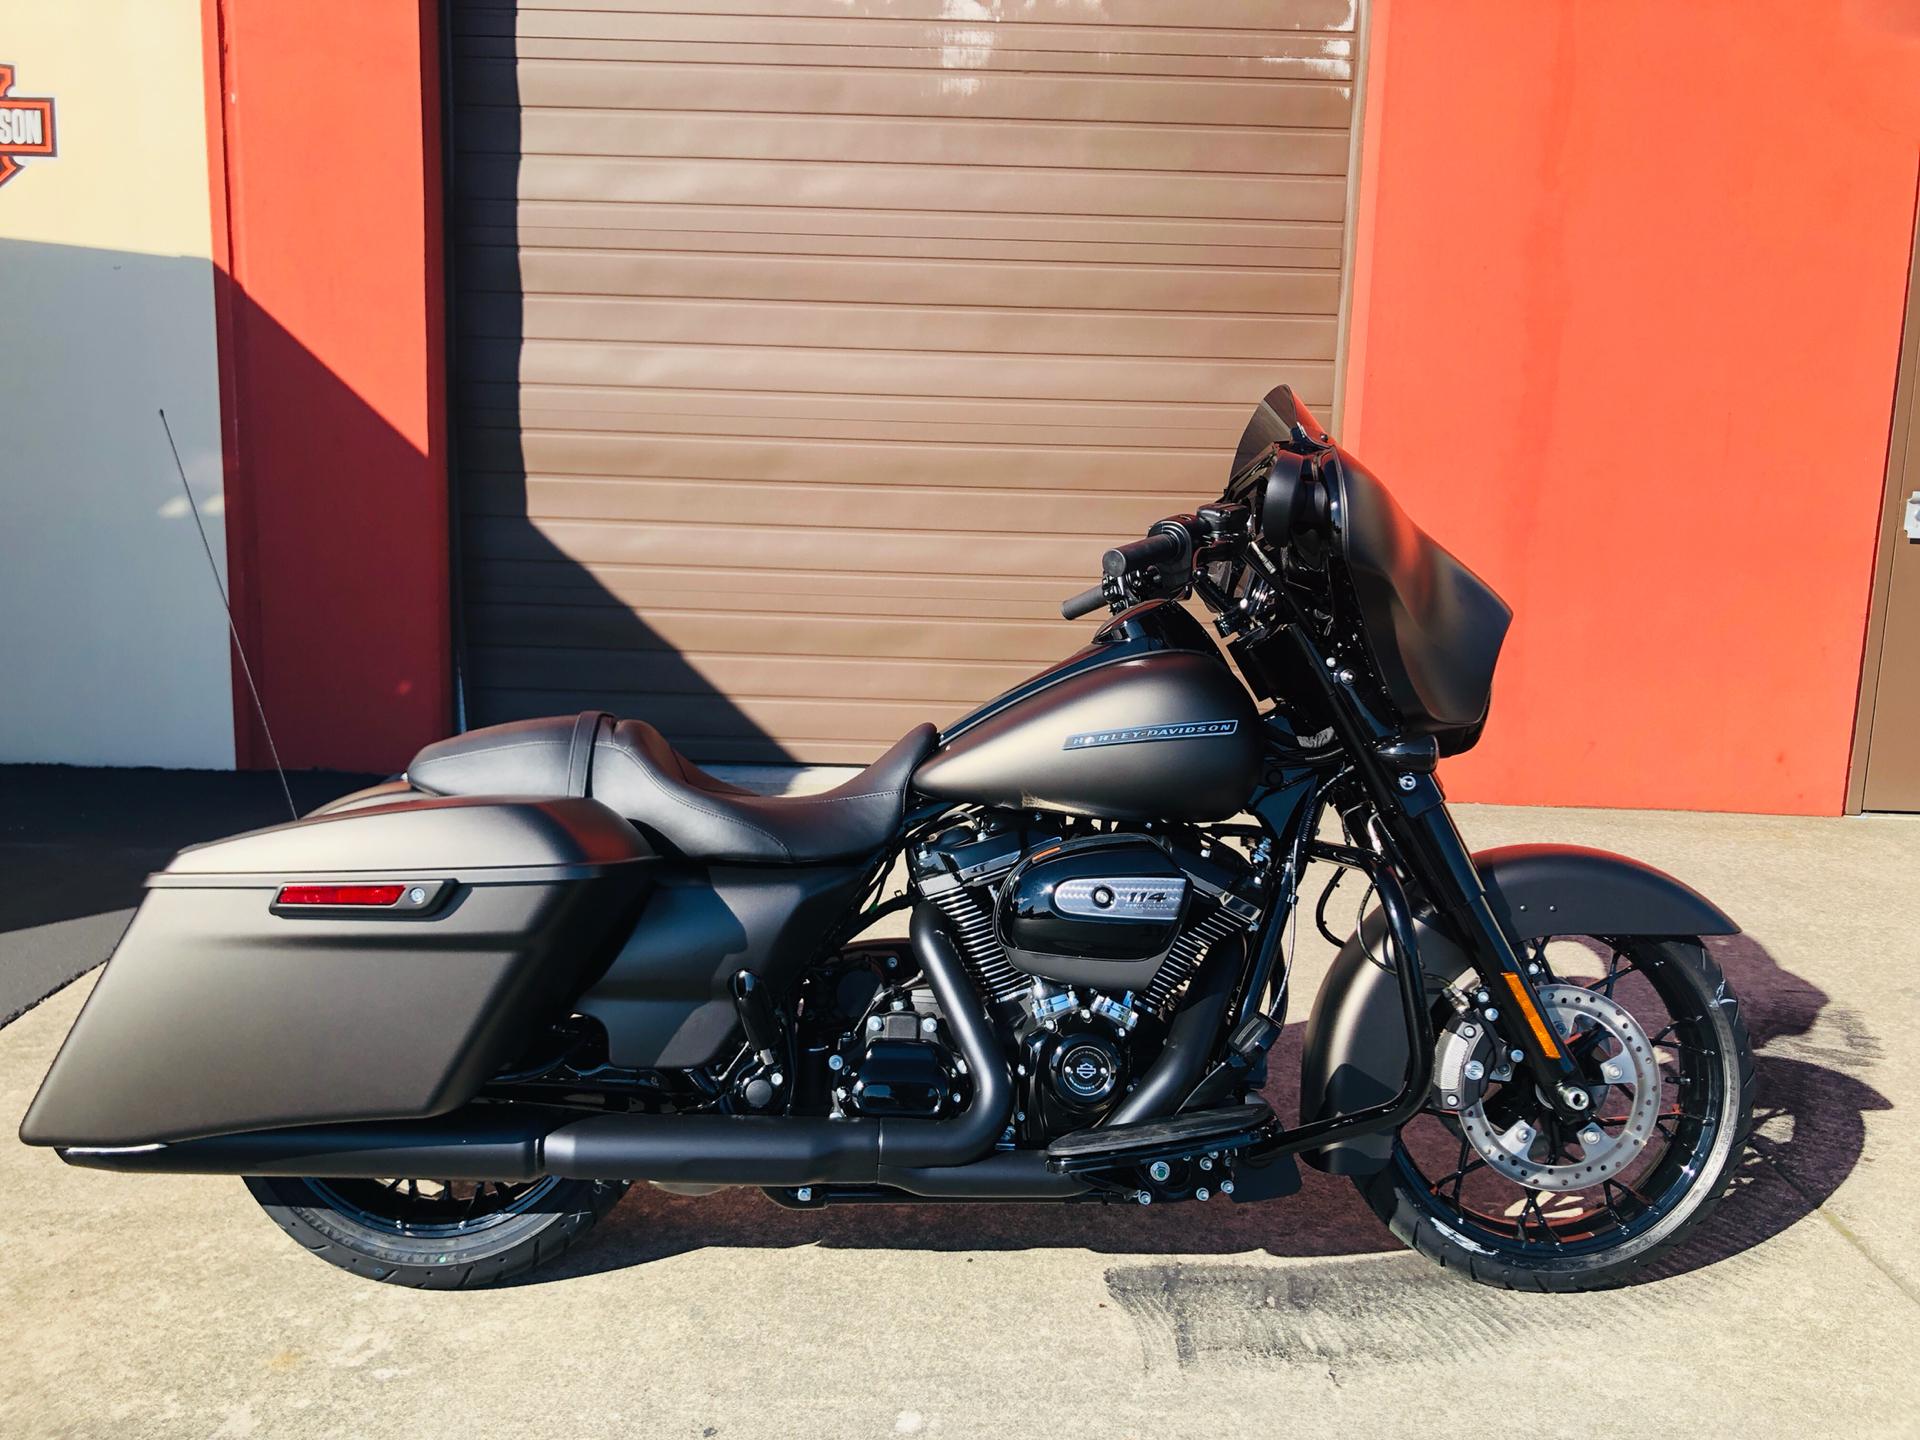 2020 Harley Davidson Street Glide Special In Burlington Washington